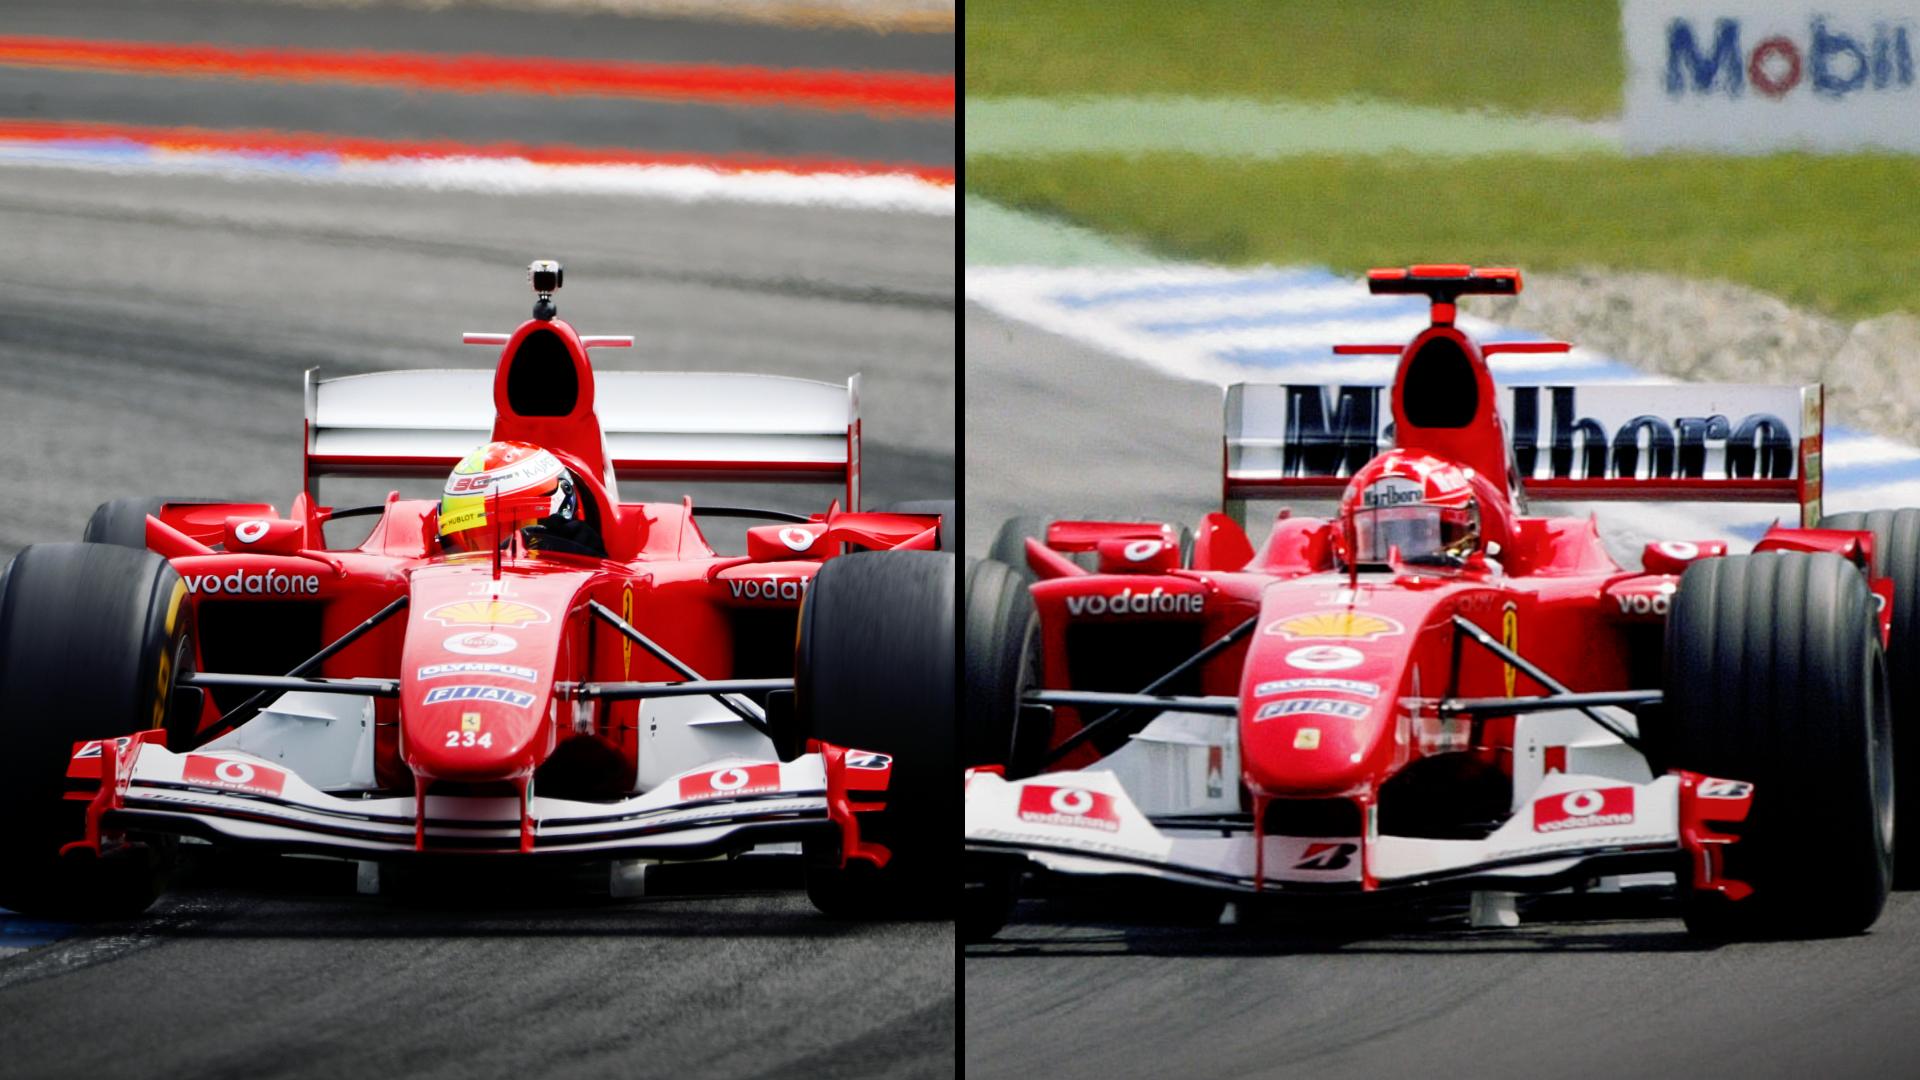 Mick Schumacher To Drive Father S 2004 Ferrari At Mugello Ahead Of Team S 1000th Gp Formula 1